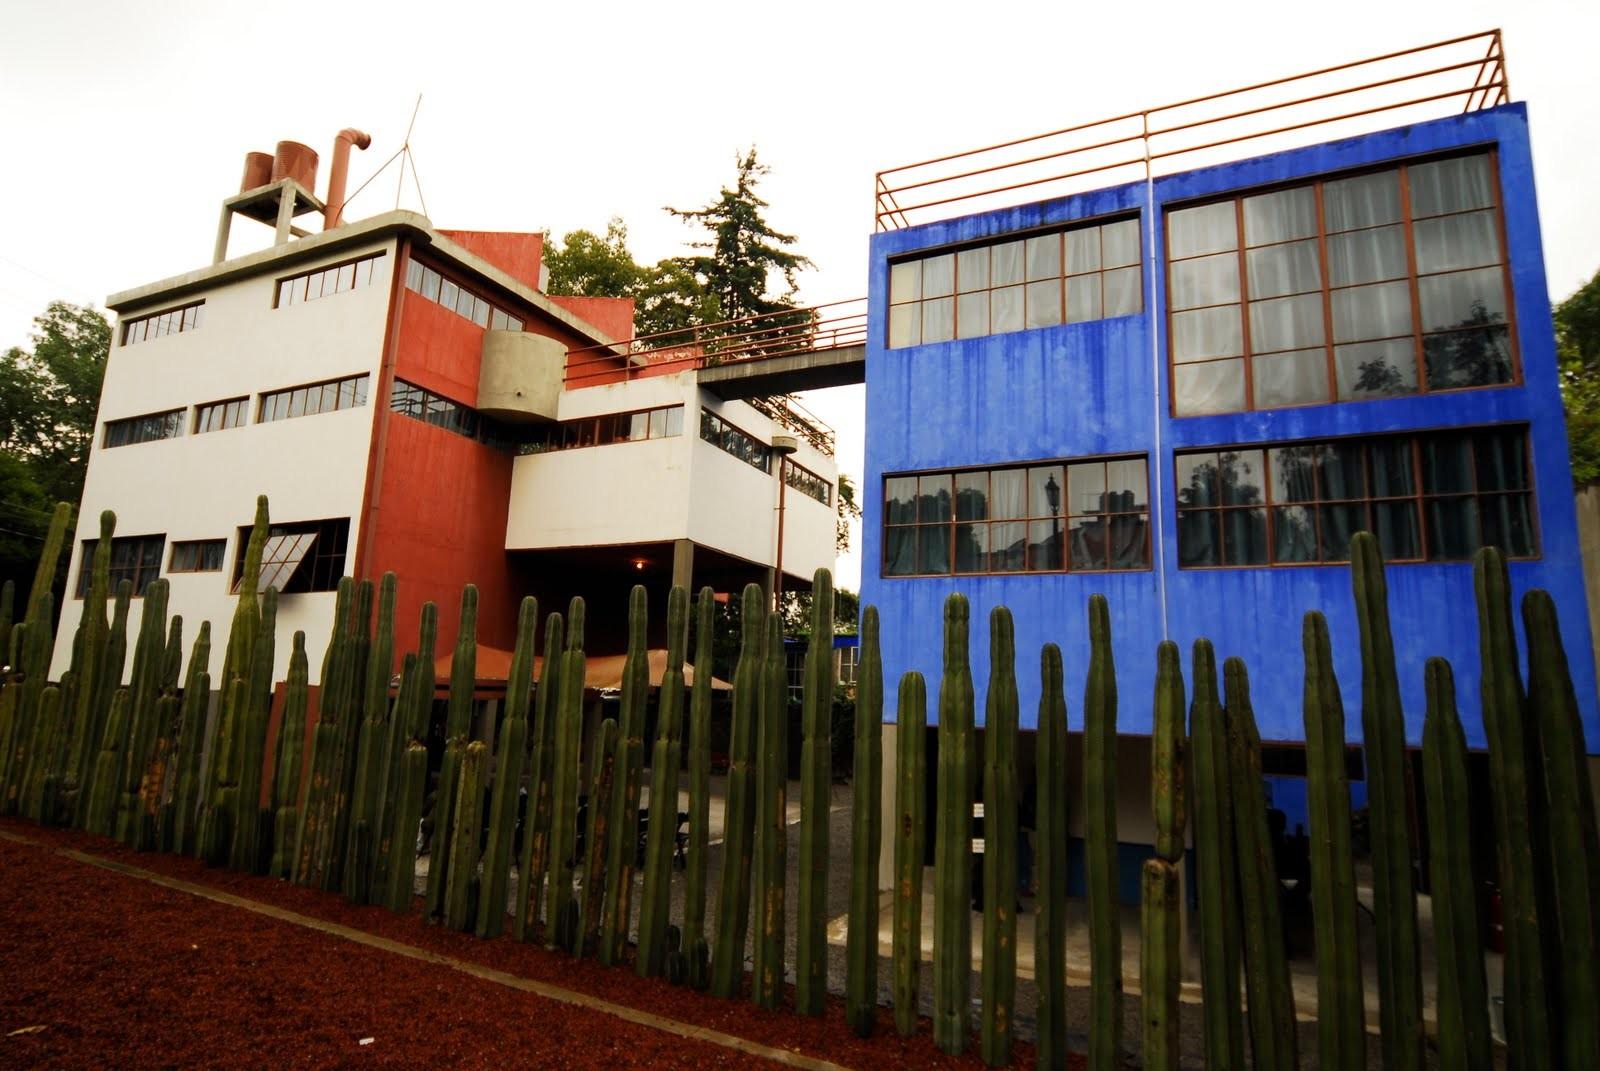 Casa Estudio de Diego Rivera y Frida Kahlo, Juan O'Gorman . Image © dondeestamalinche.blogspot.com